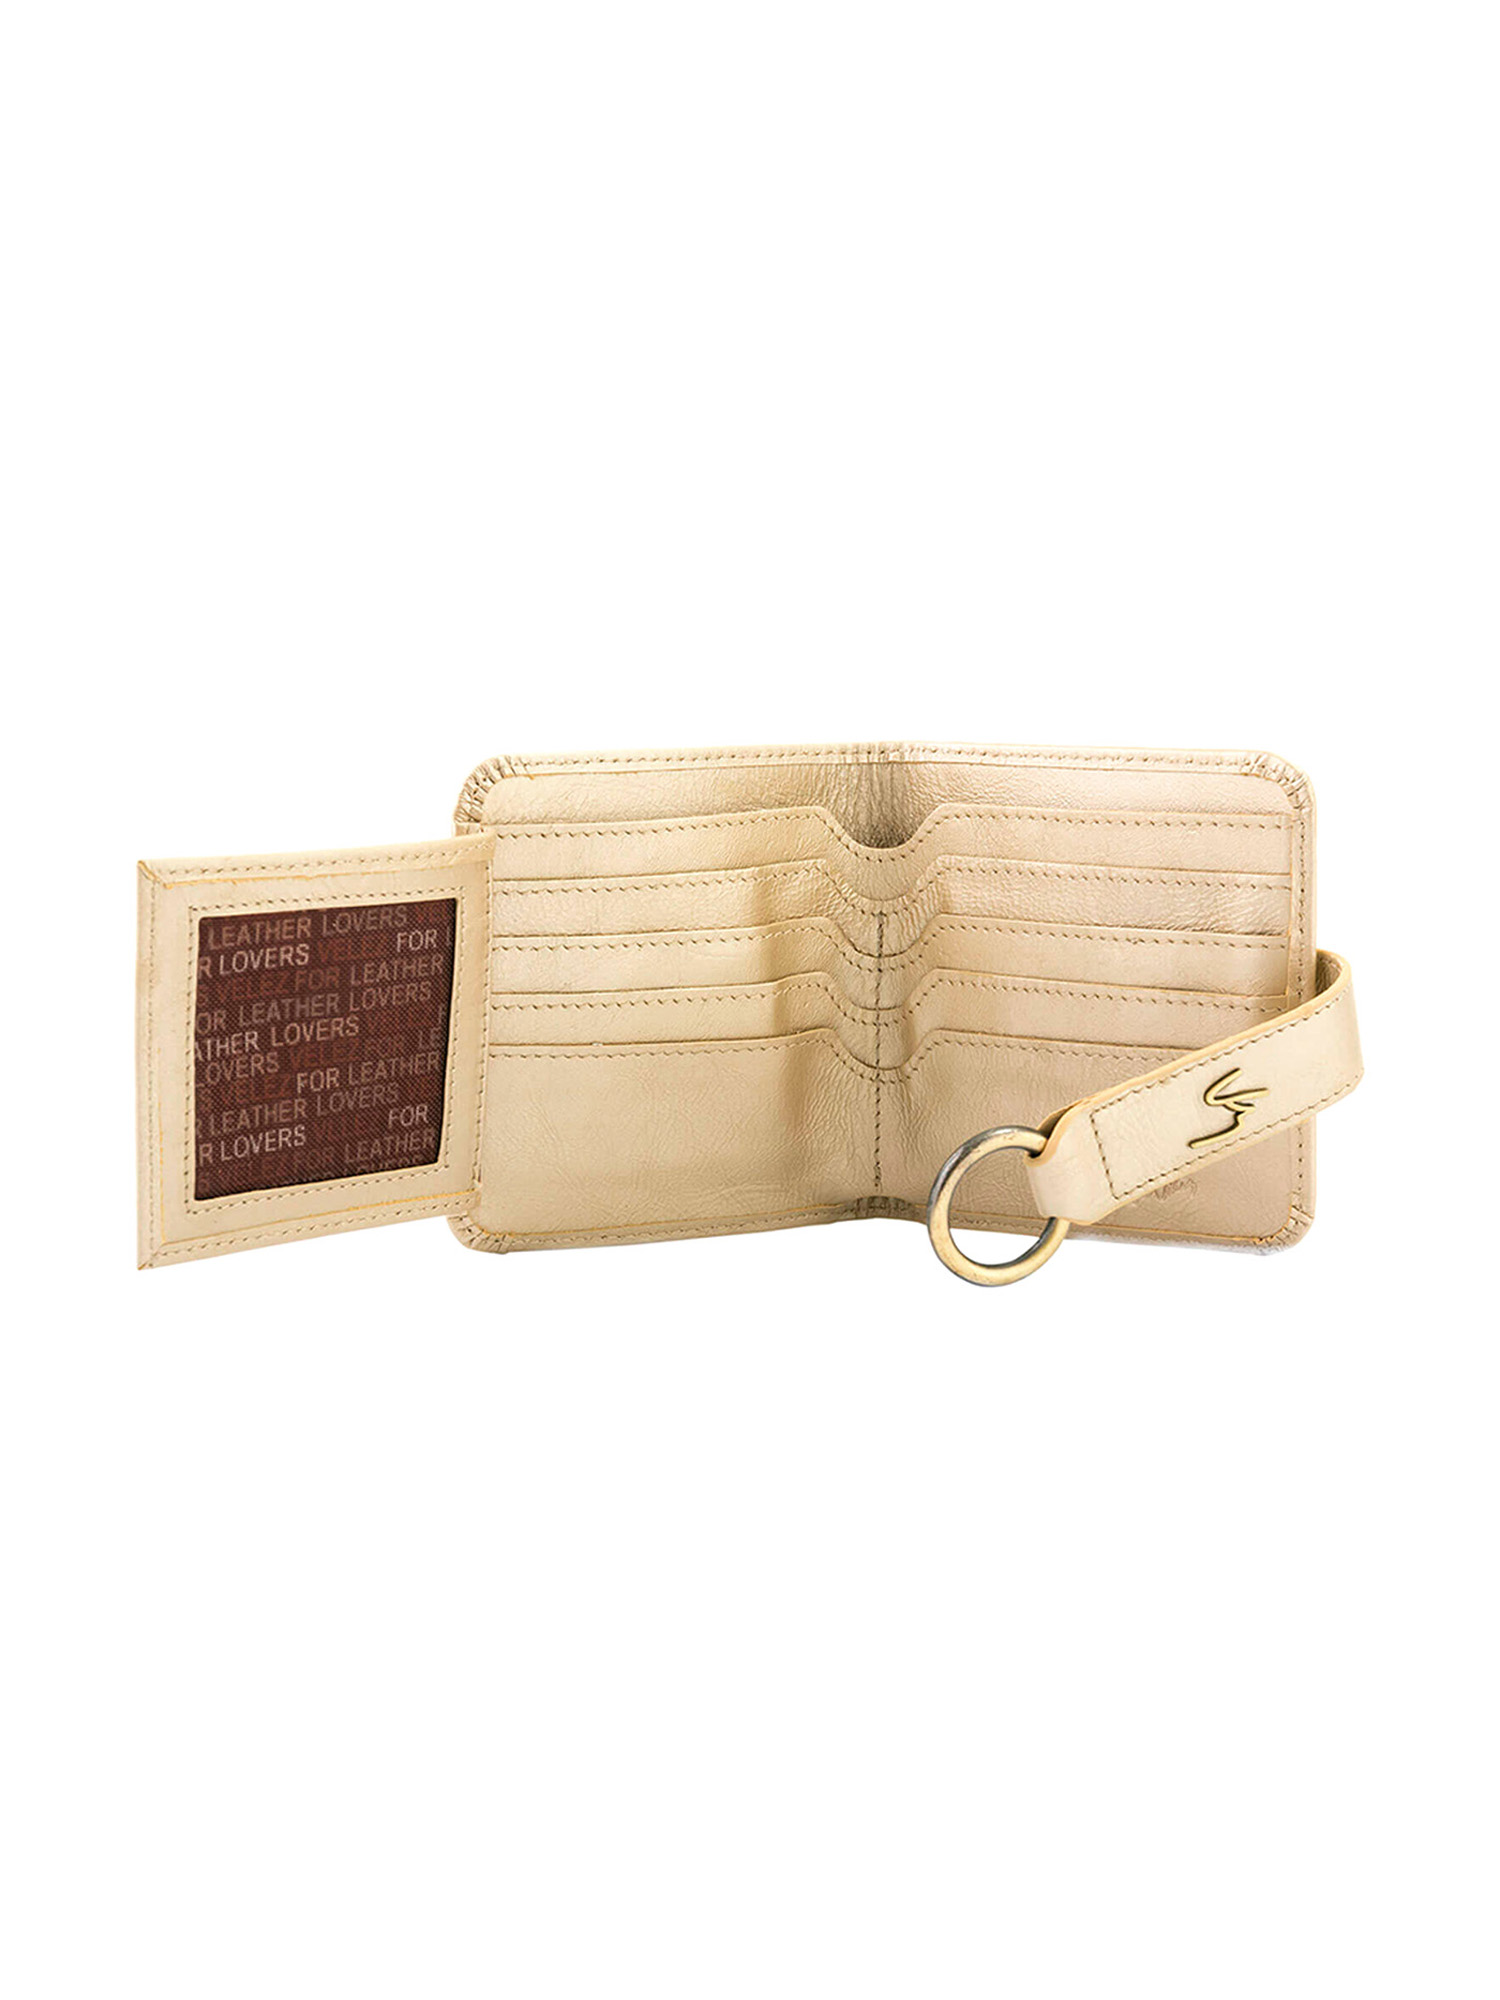 879881cb0 Velez - Velez Genuine Full Grain Leather Bifold Wallet for Women Billetera  Cuero Mujer - Walmart.com